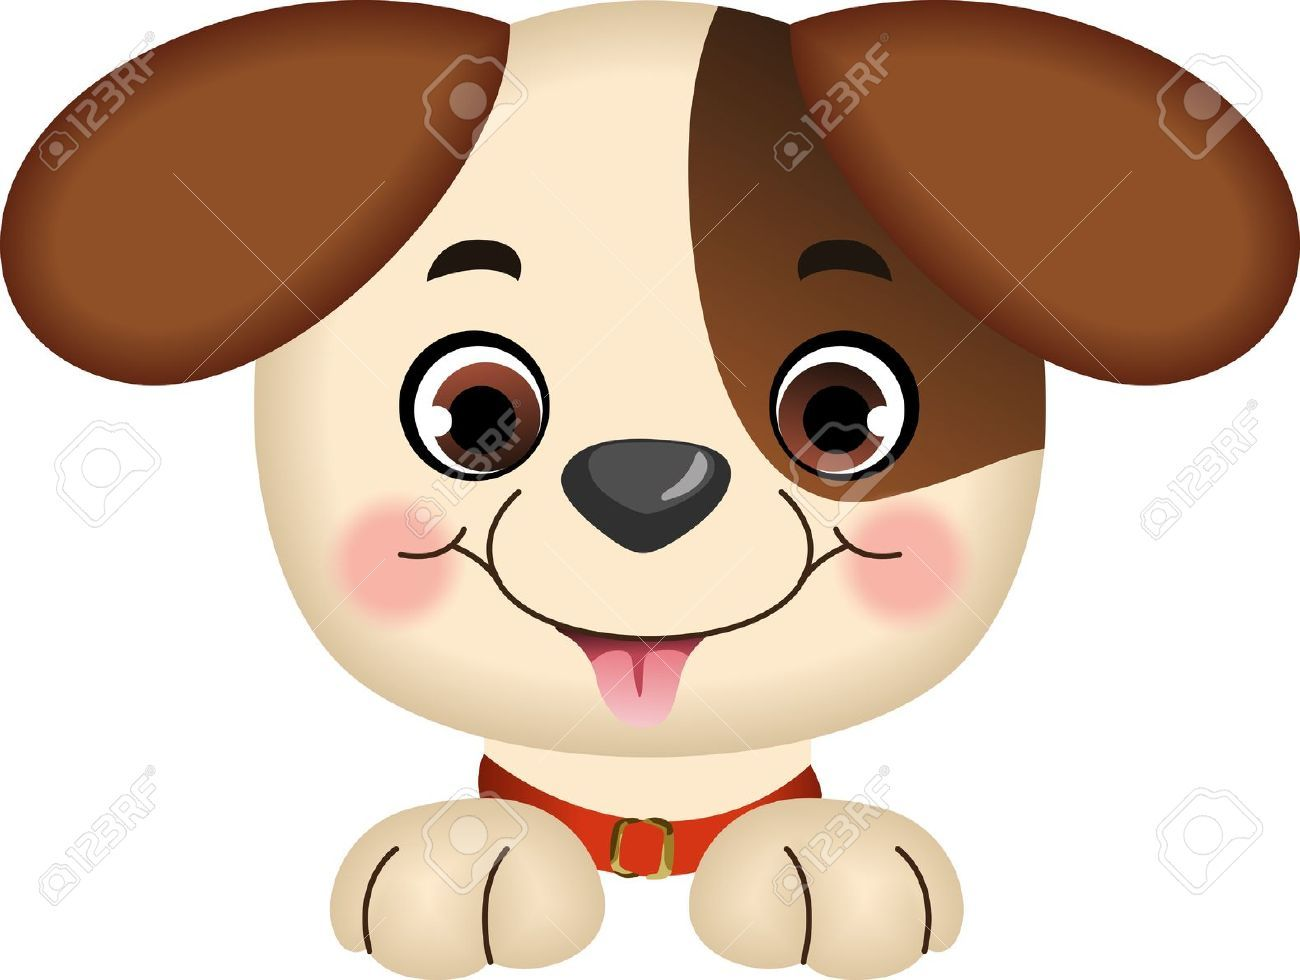 Dog Peeking Royalty Free Cliparts, Vectors, And Stock Illustration ...